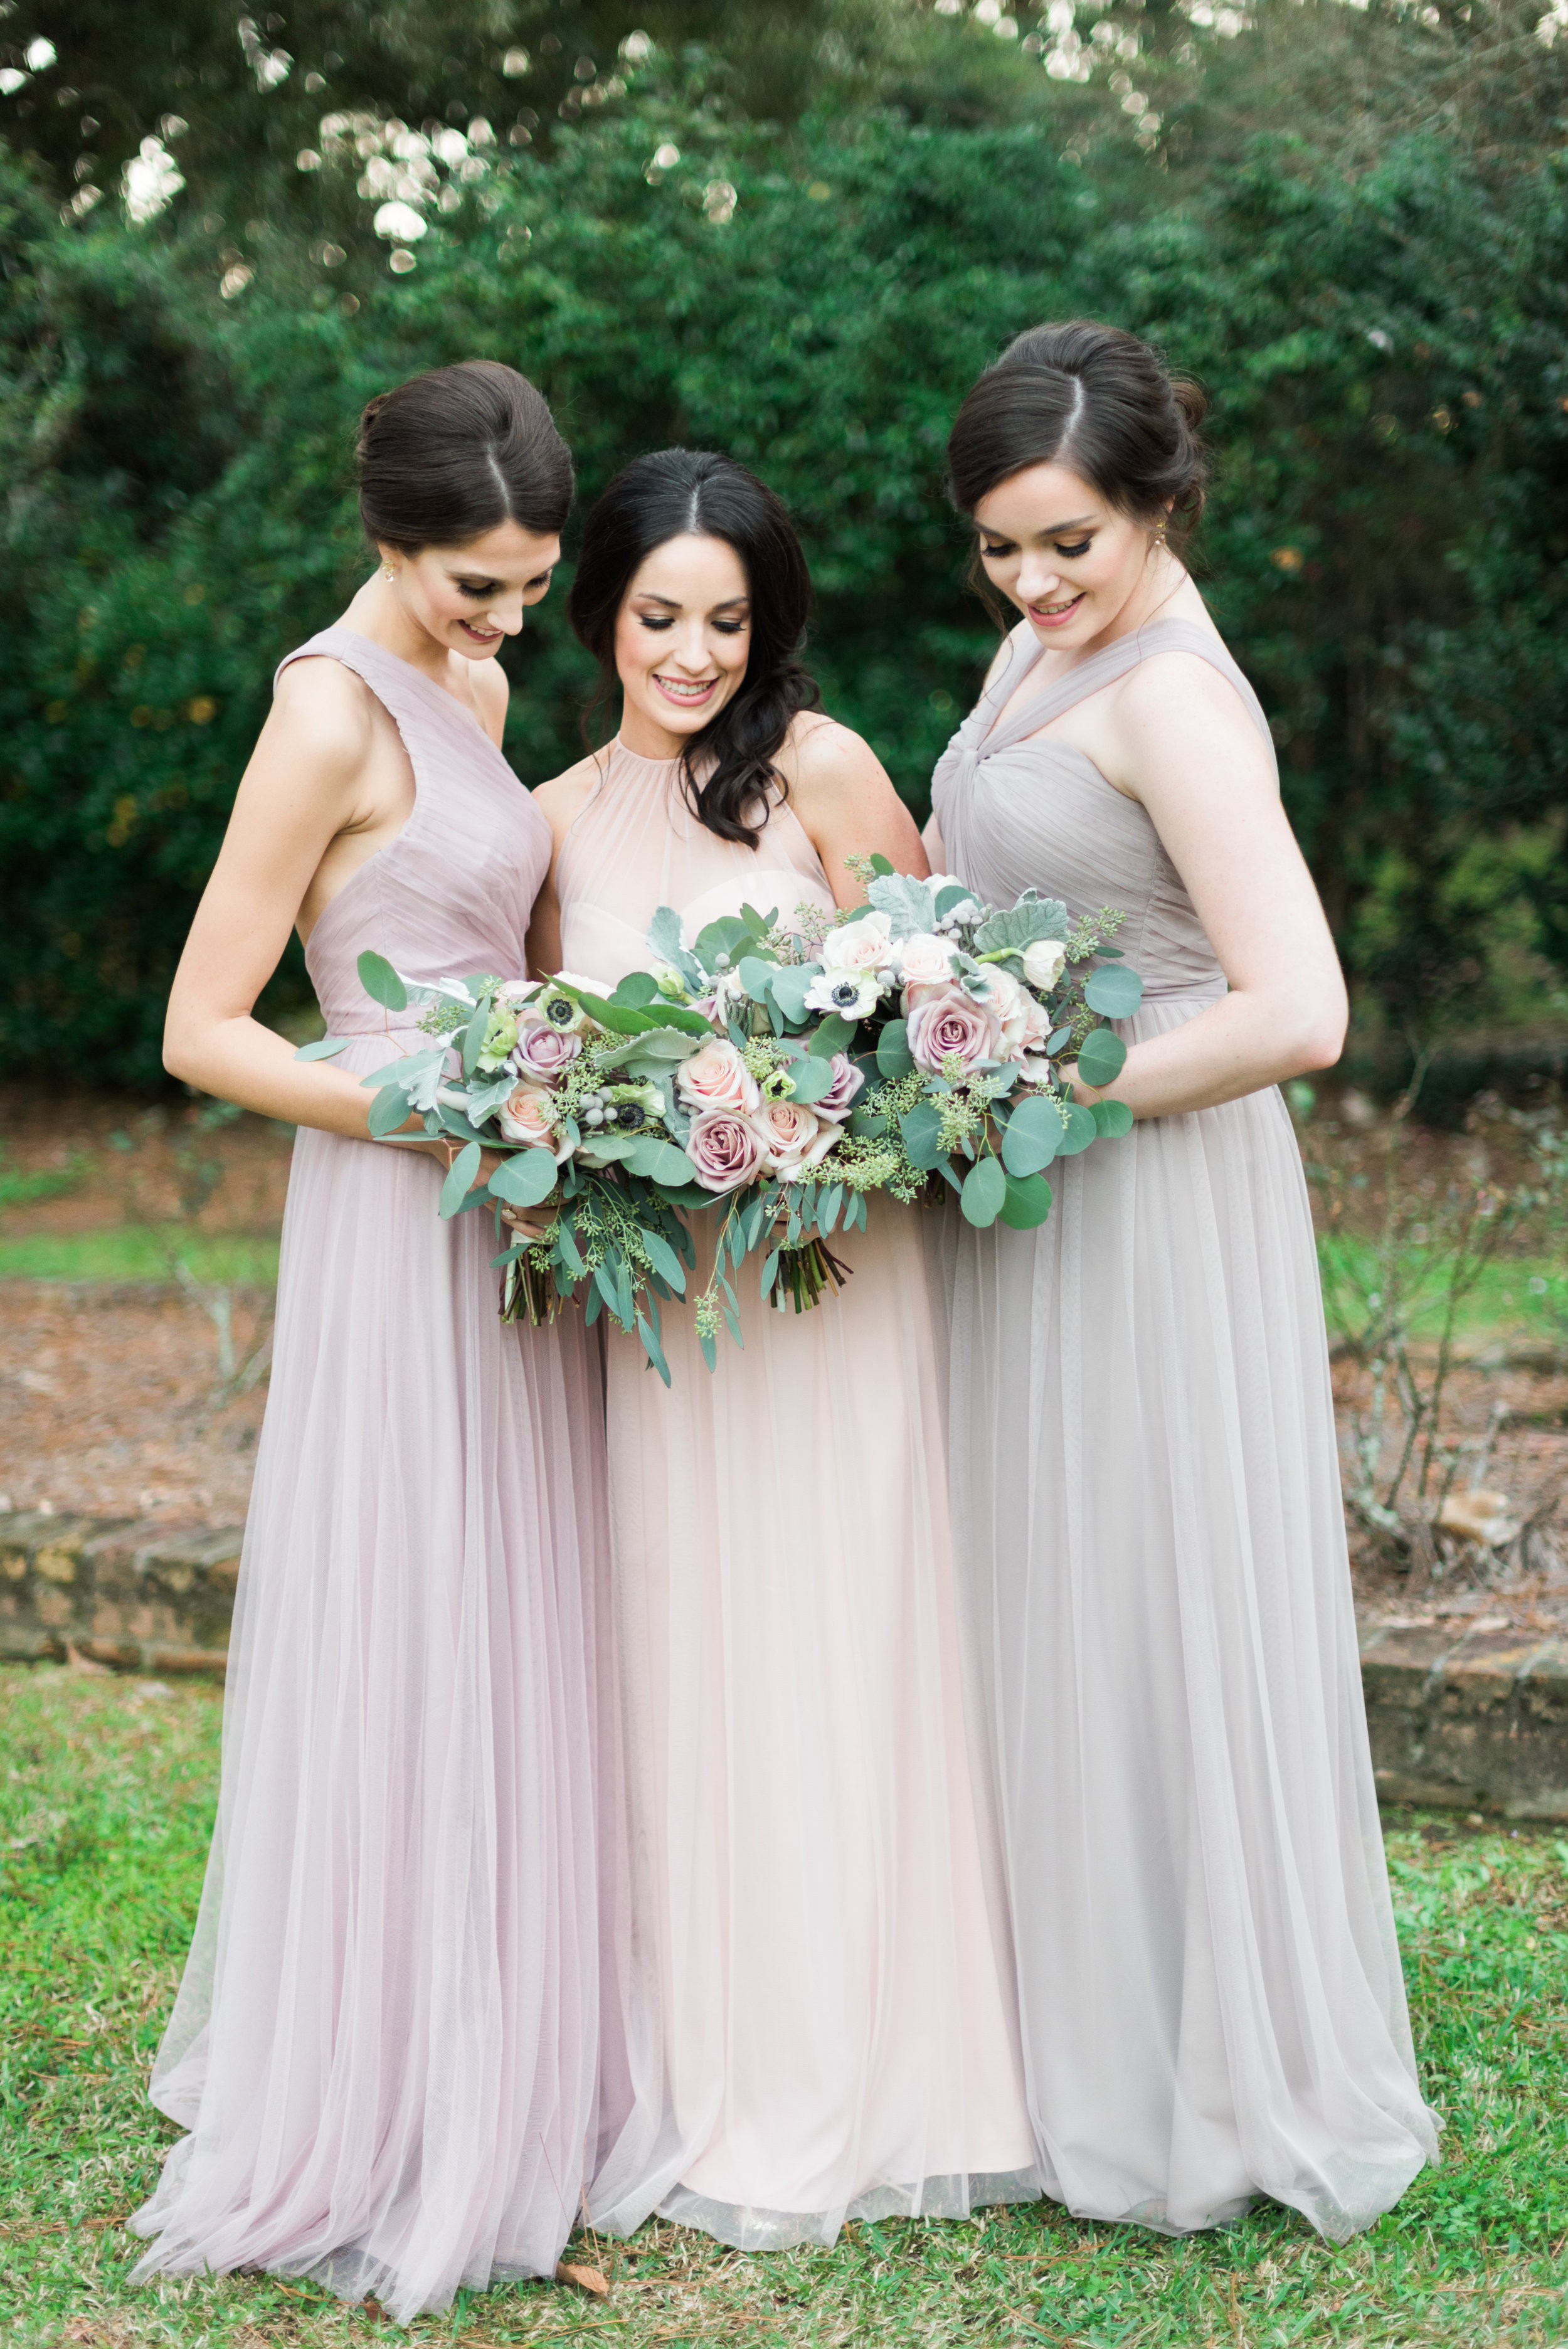 Southern Fete, Southern Wedding, Bridesmaids' dresses, Flower Bouquet